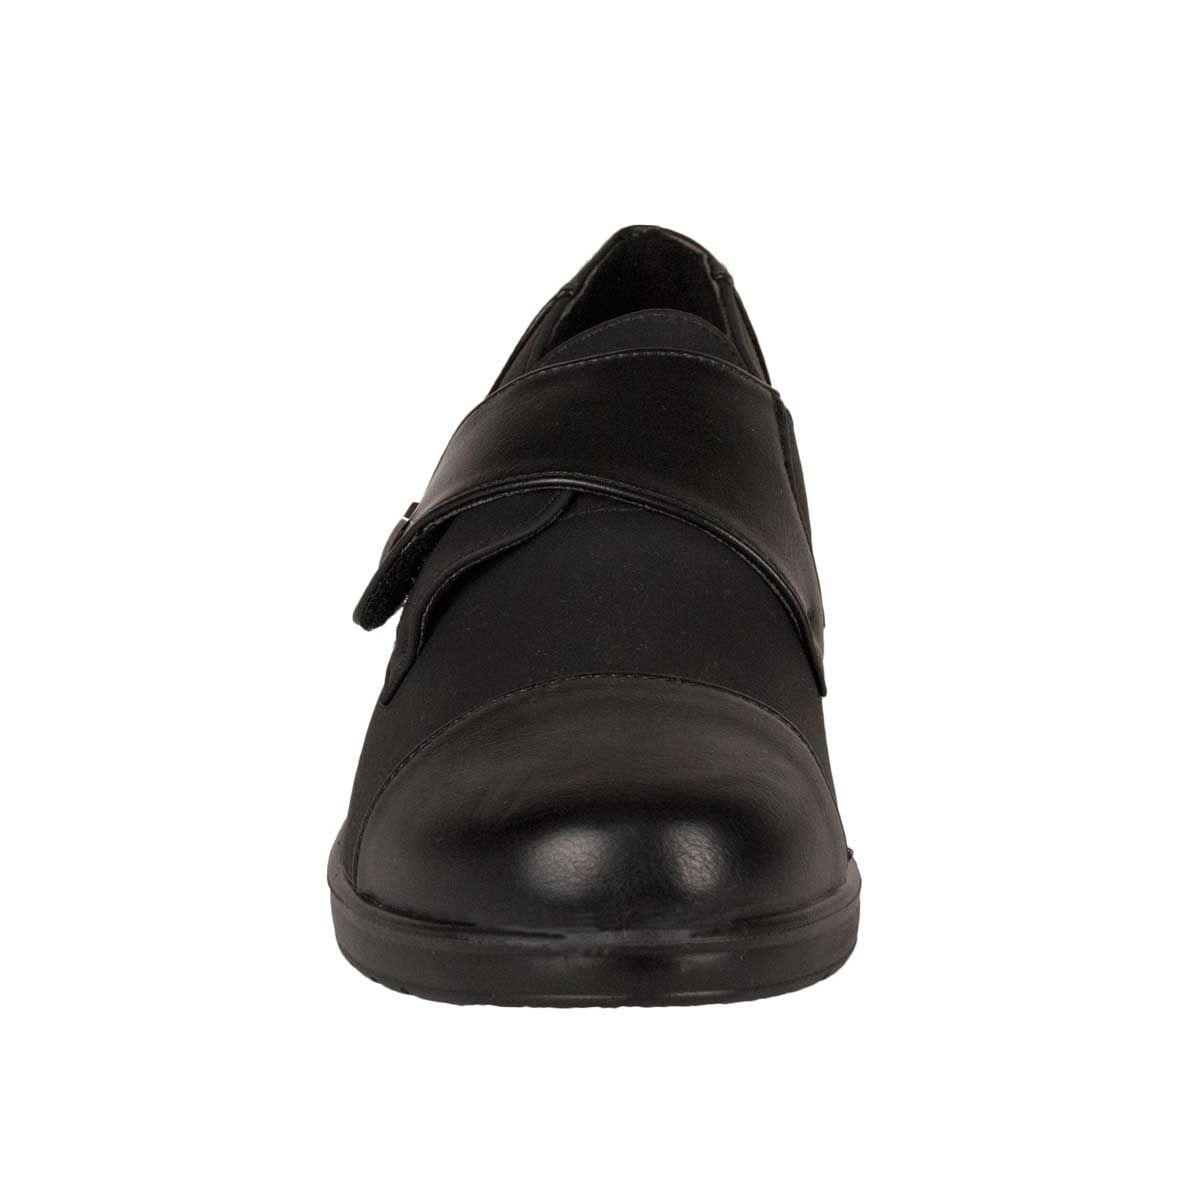 Montevita Comfortable Moccasin in Black